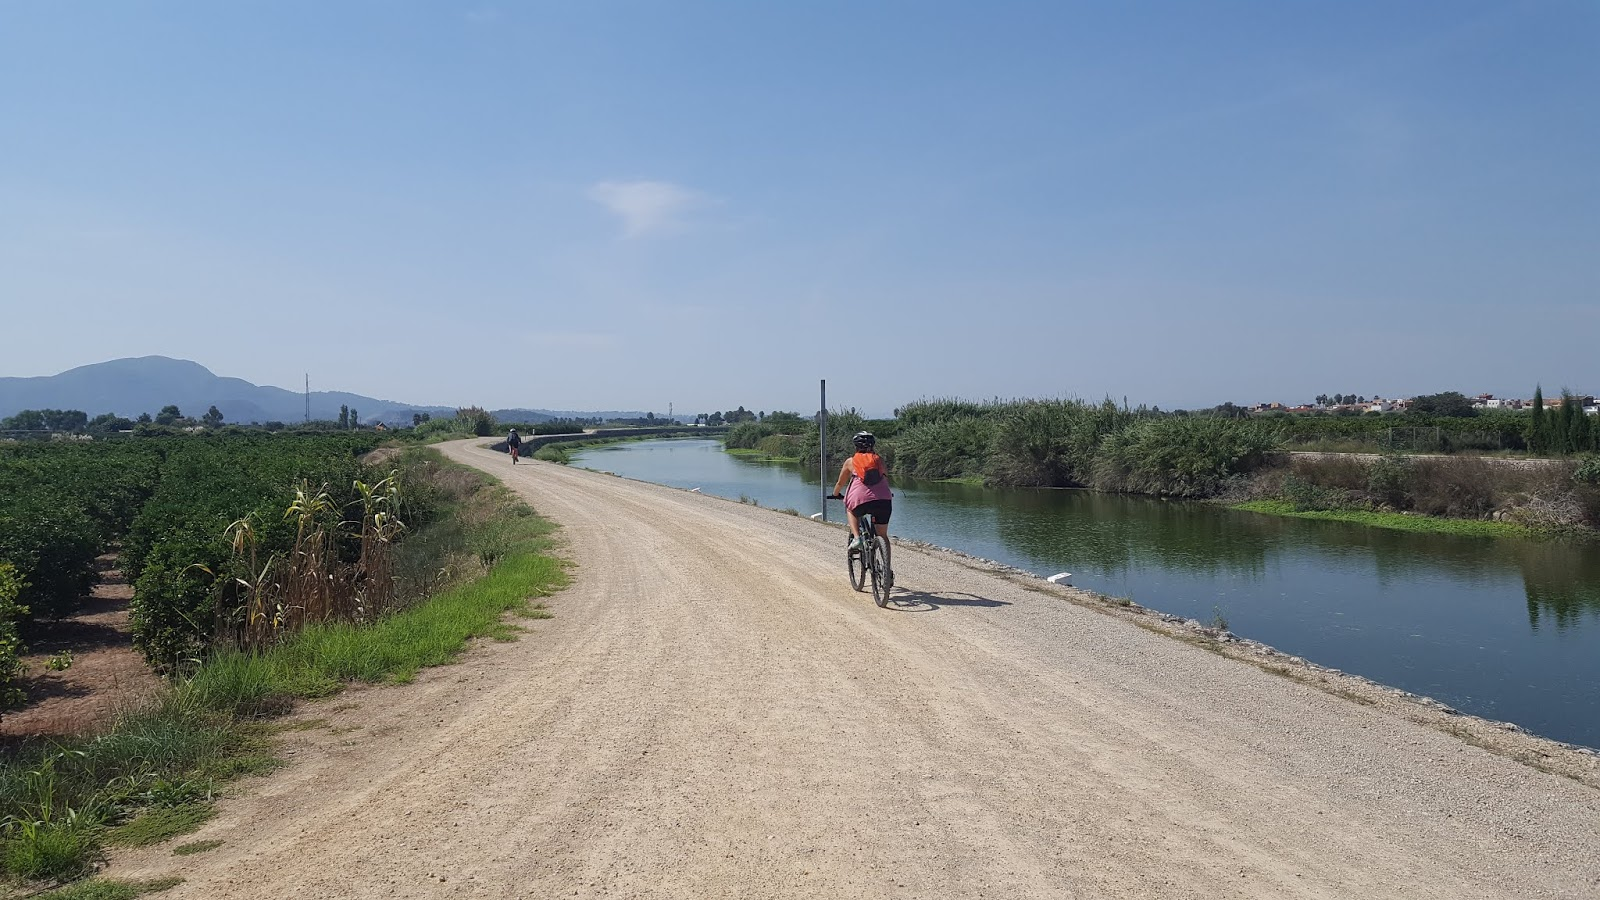 La mota running along the south bank of the River Júcar